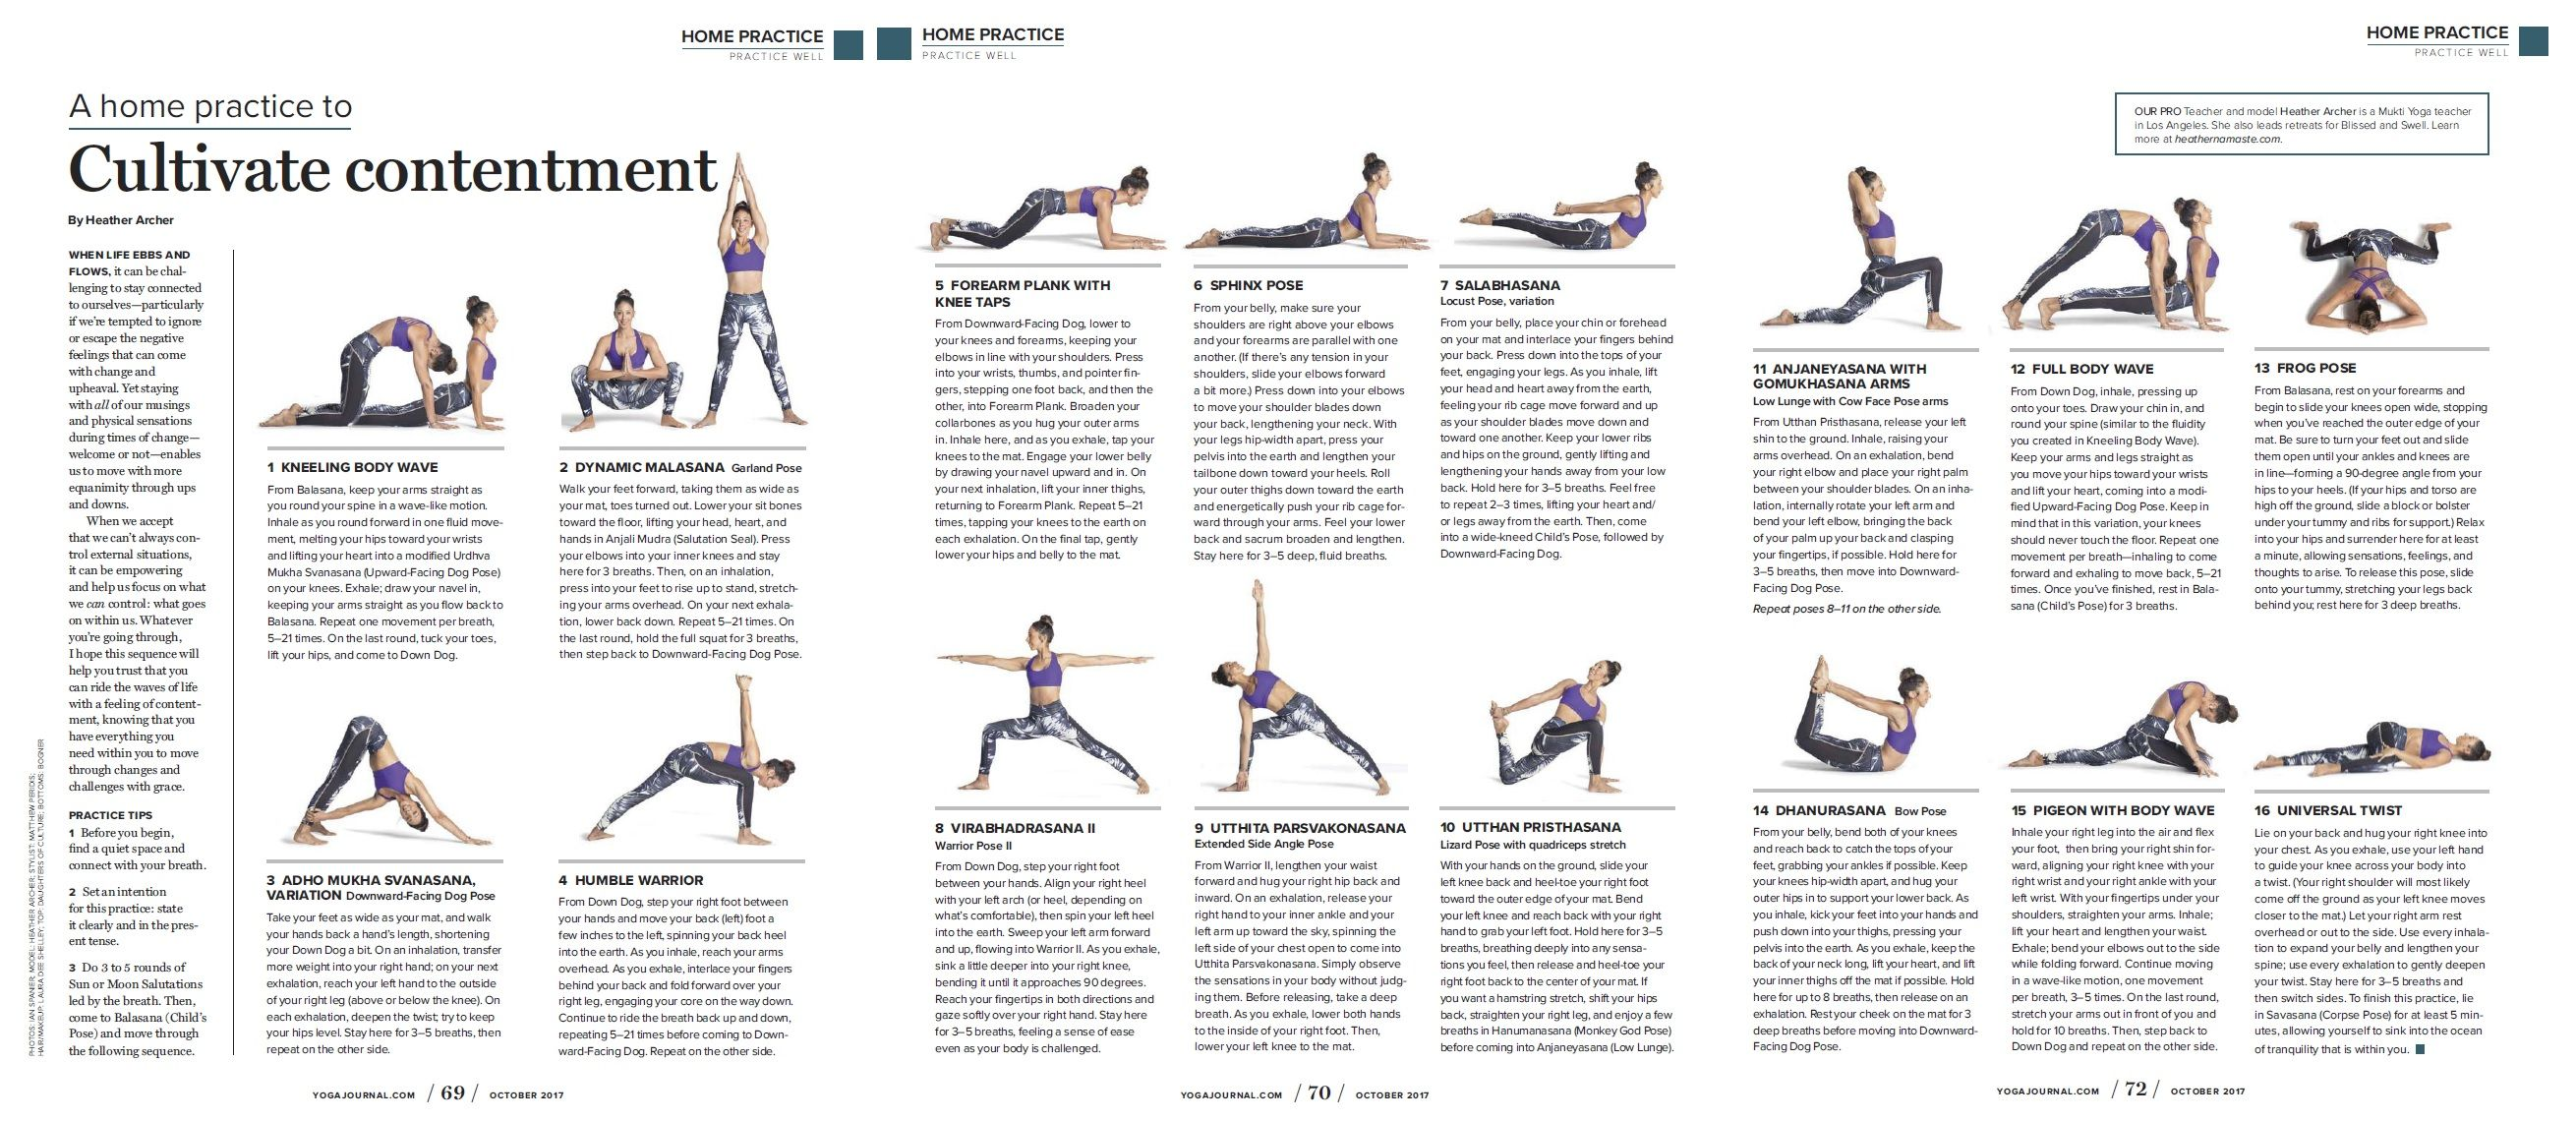 Yoga Sequence In Yoga Journal Yoga Sequences Yoga Practice Yoga Journal